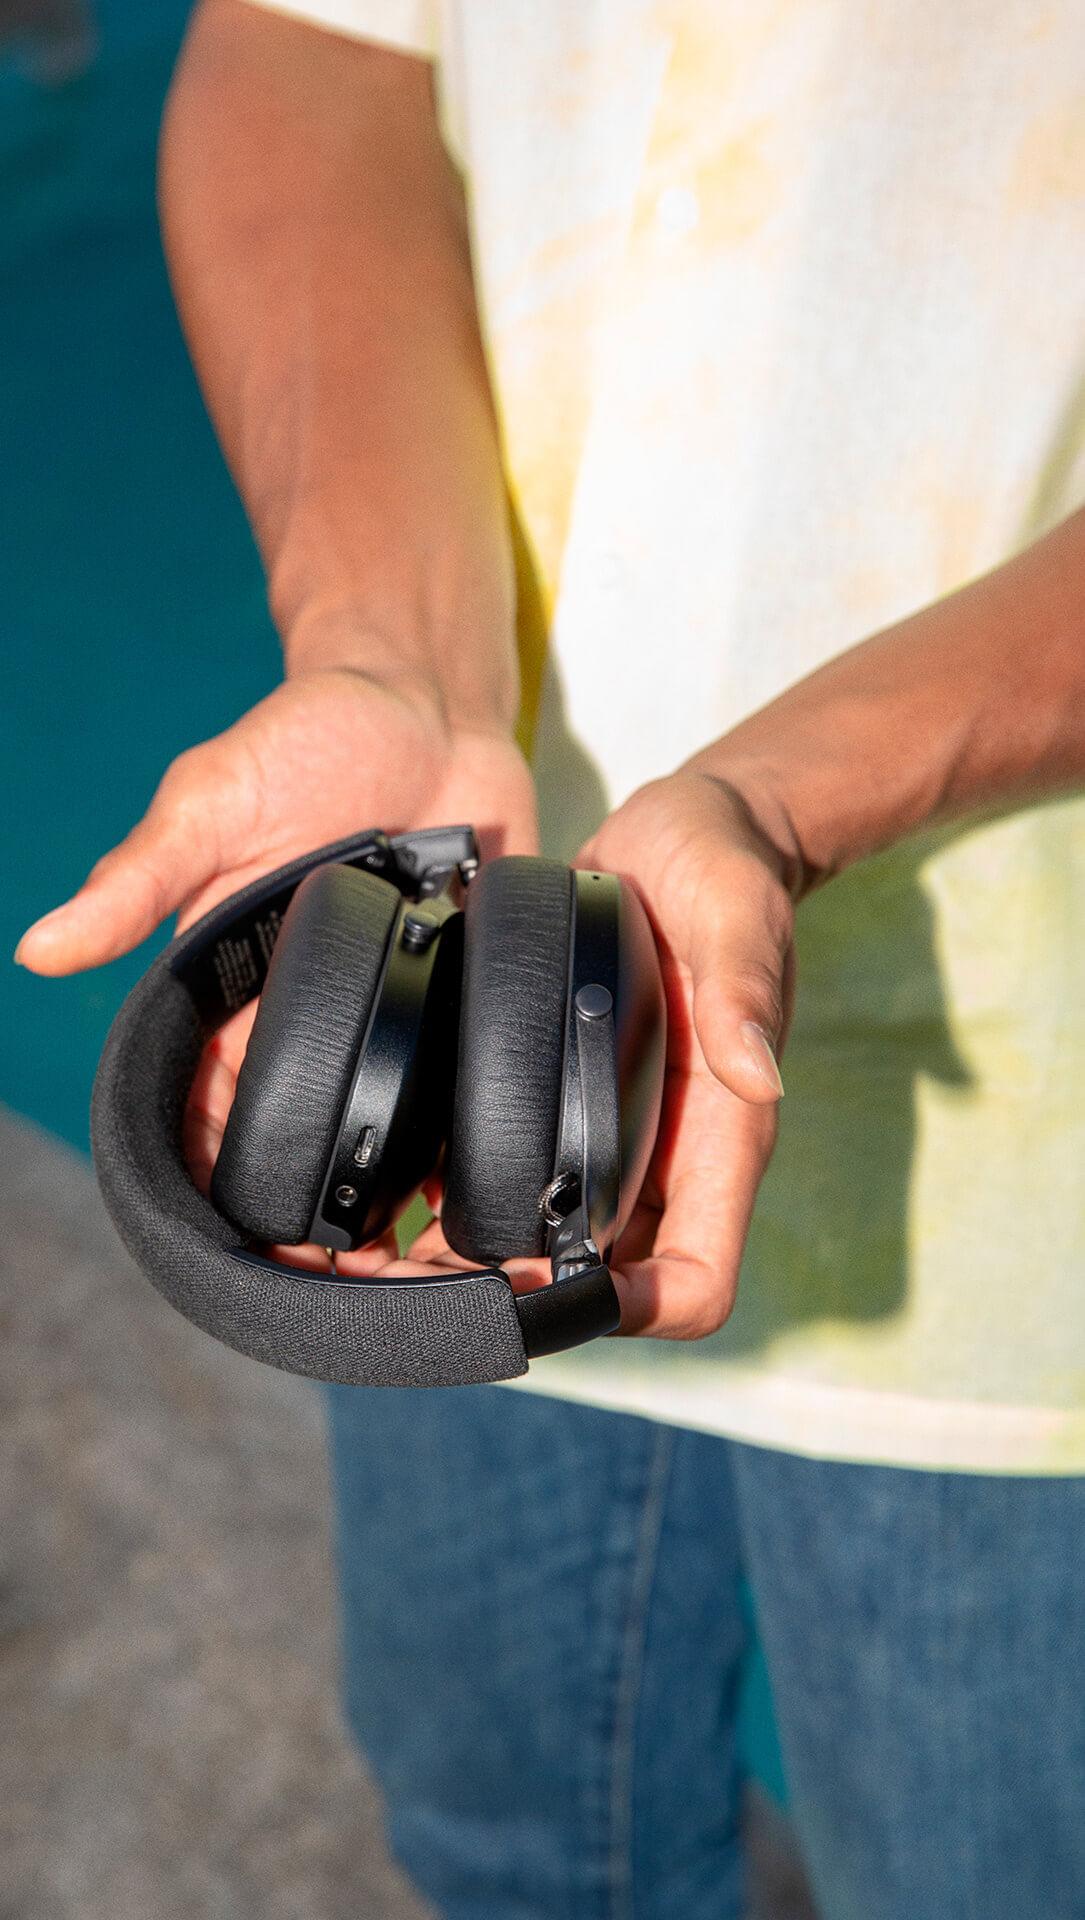 Audífonos Positive Vibration XL Negros de The House of Marley